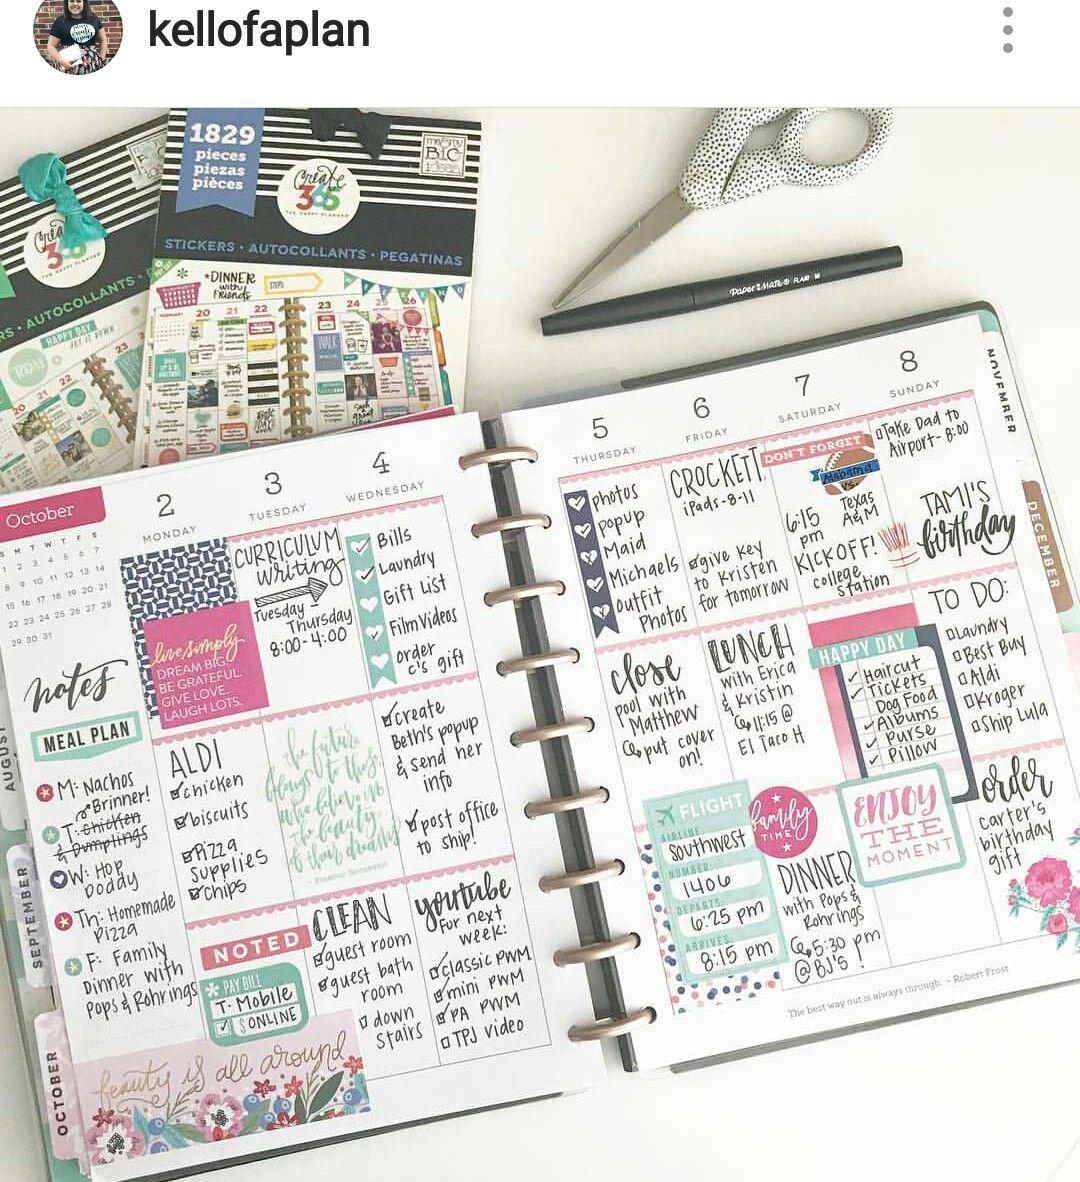 Pin de Laydiiee Lynne en Profashionale | Pinterest | Apuntes ...